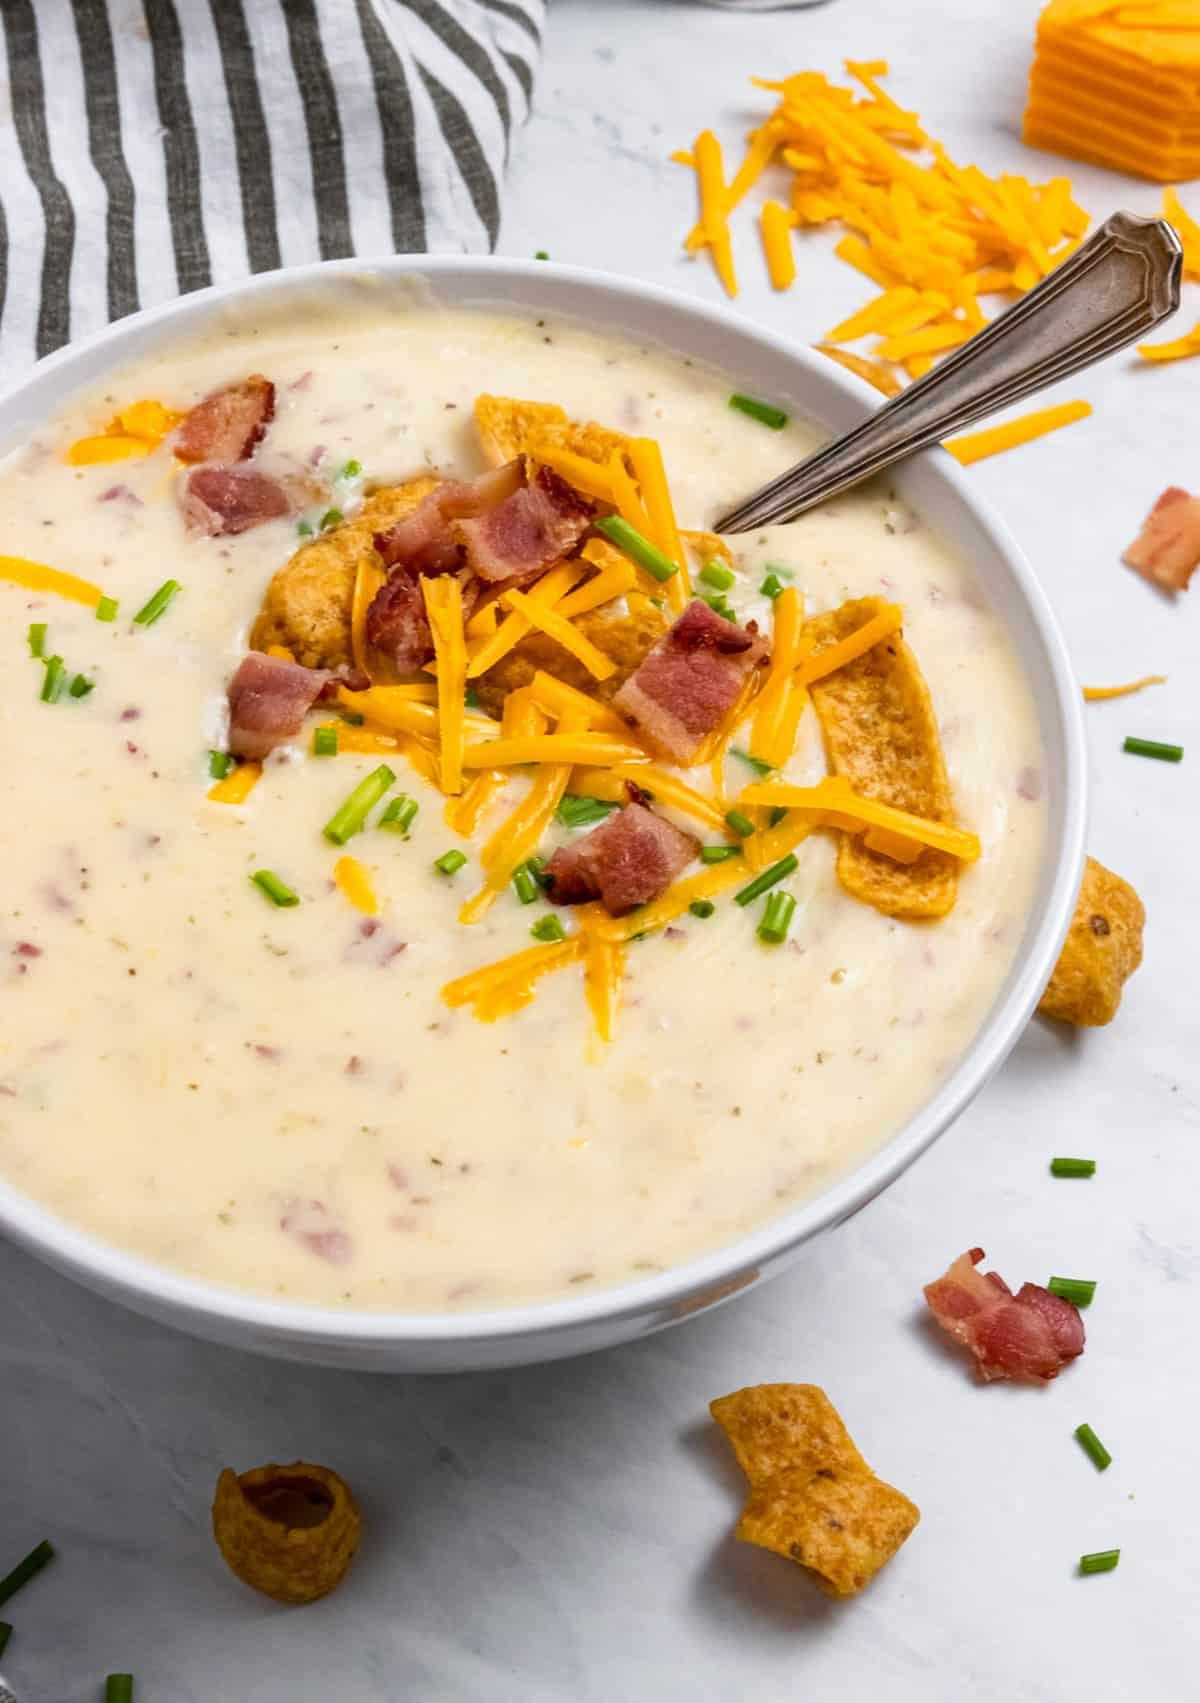 Bowl of Instant Pot Potato Leek Soup with spoon.